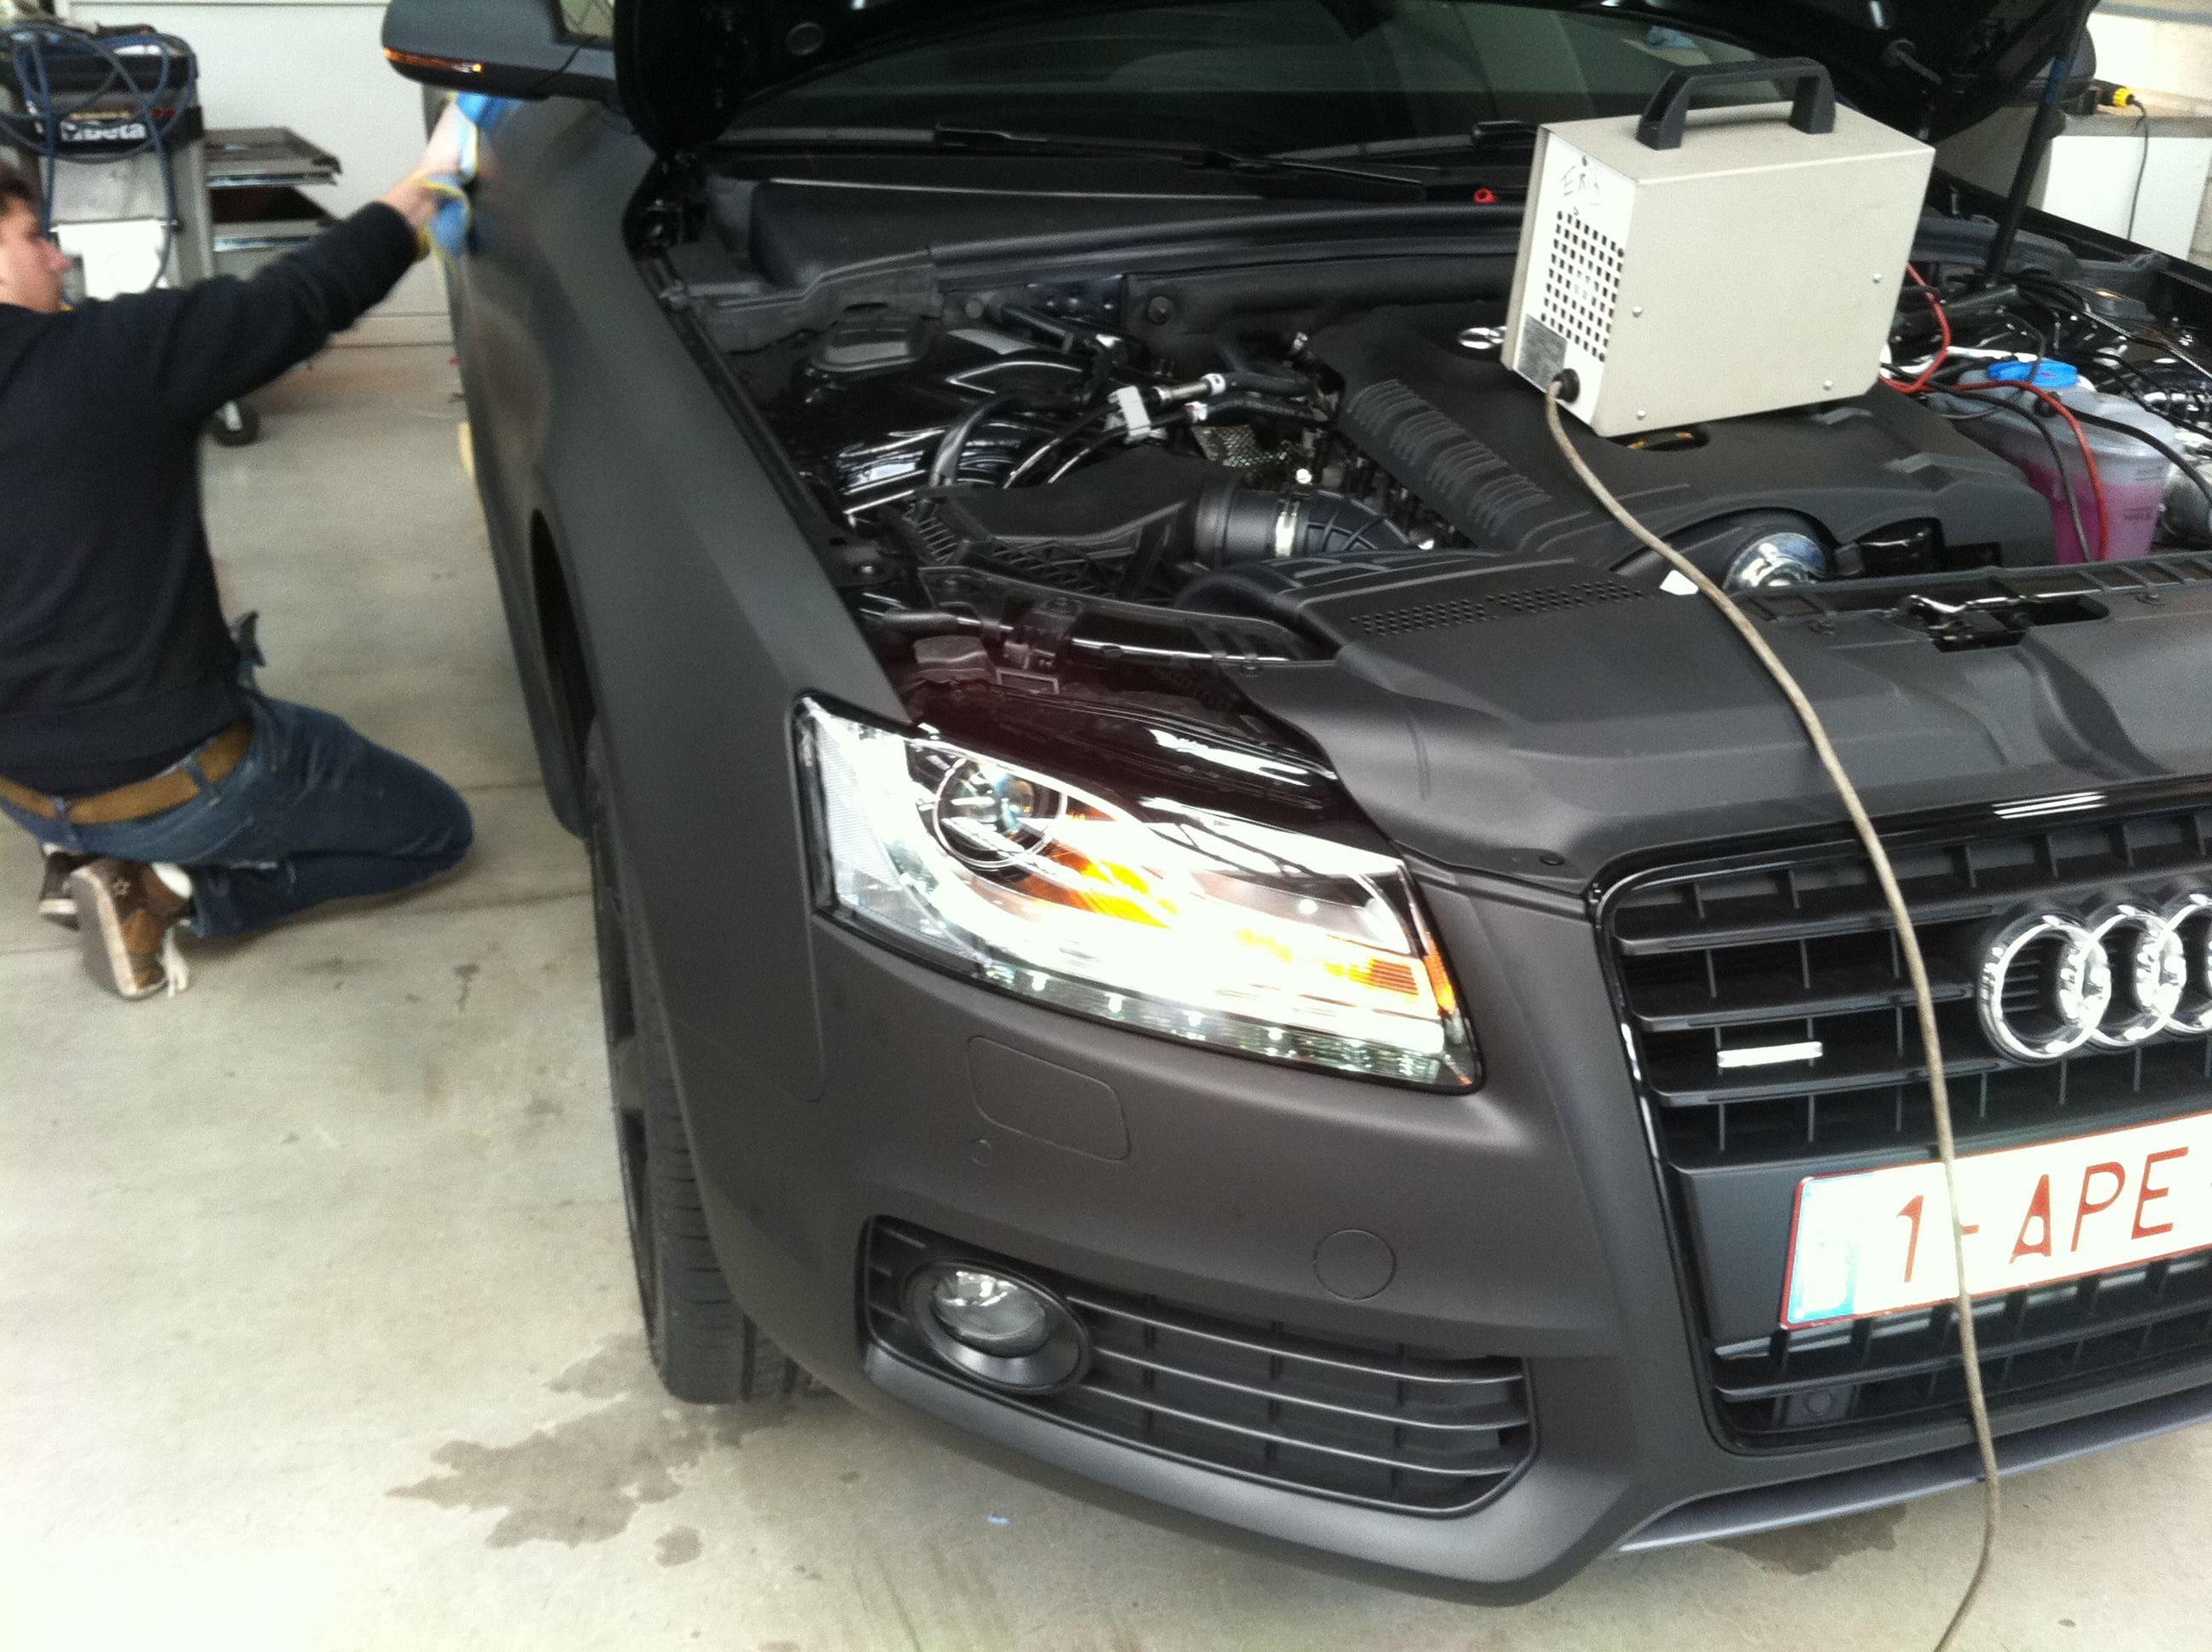 Audi A5 Coupe met Mat Zwarte Wrap, Carwrapping door Wrapmyride.nu Foto-nr:4589, ©2021